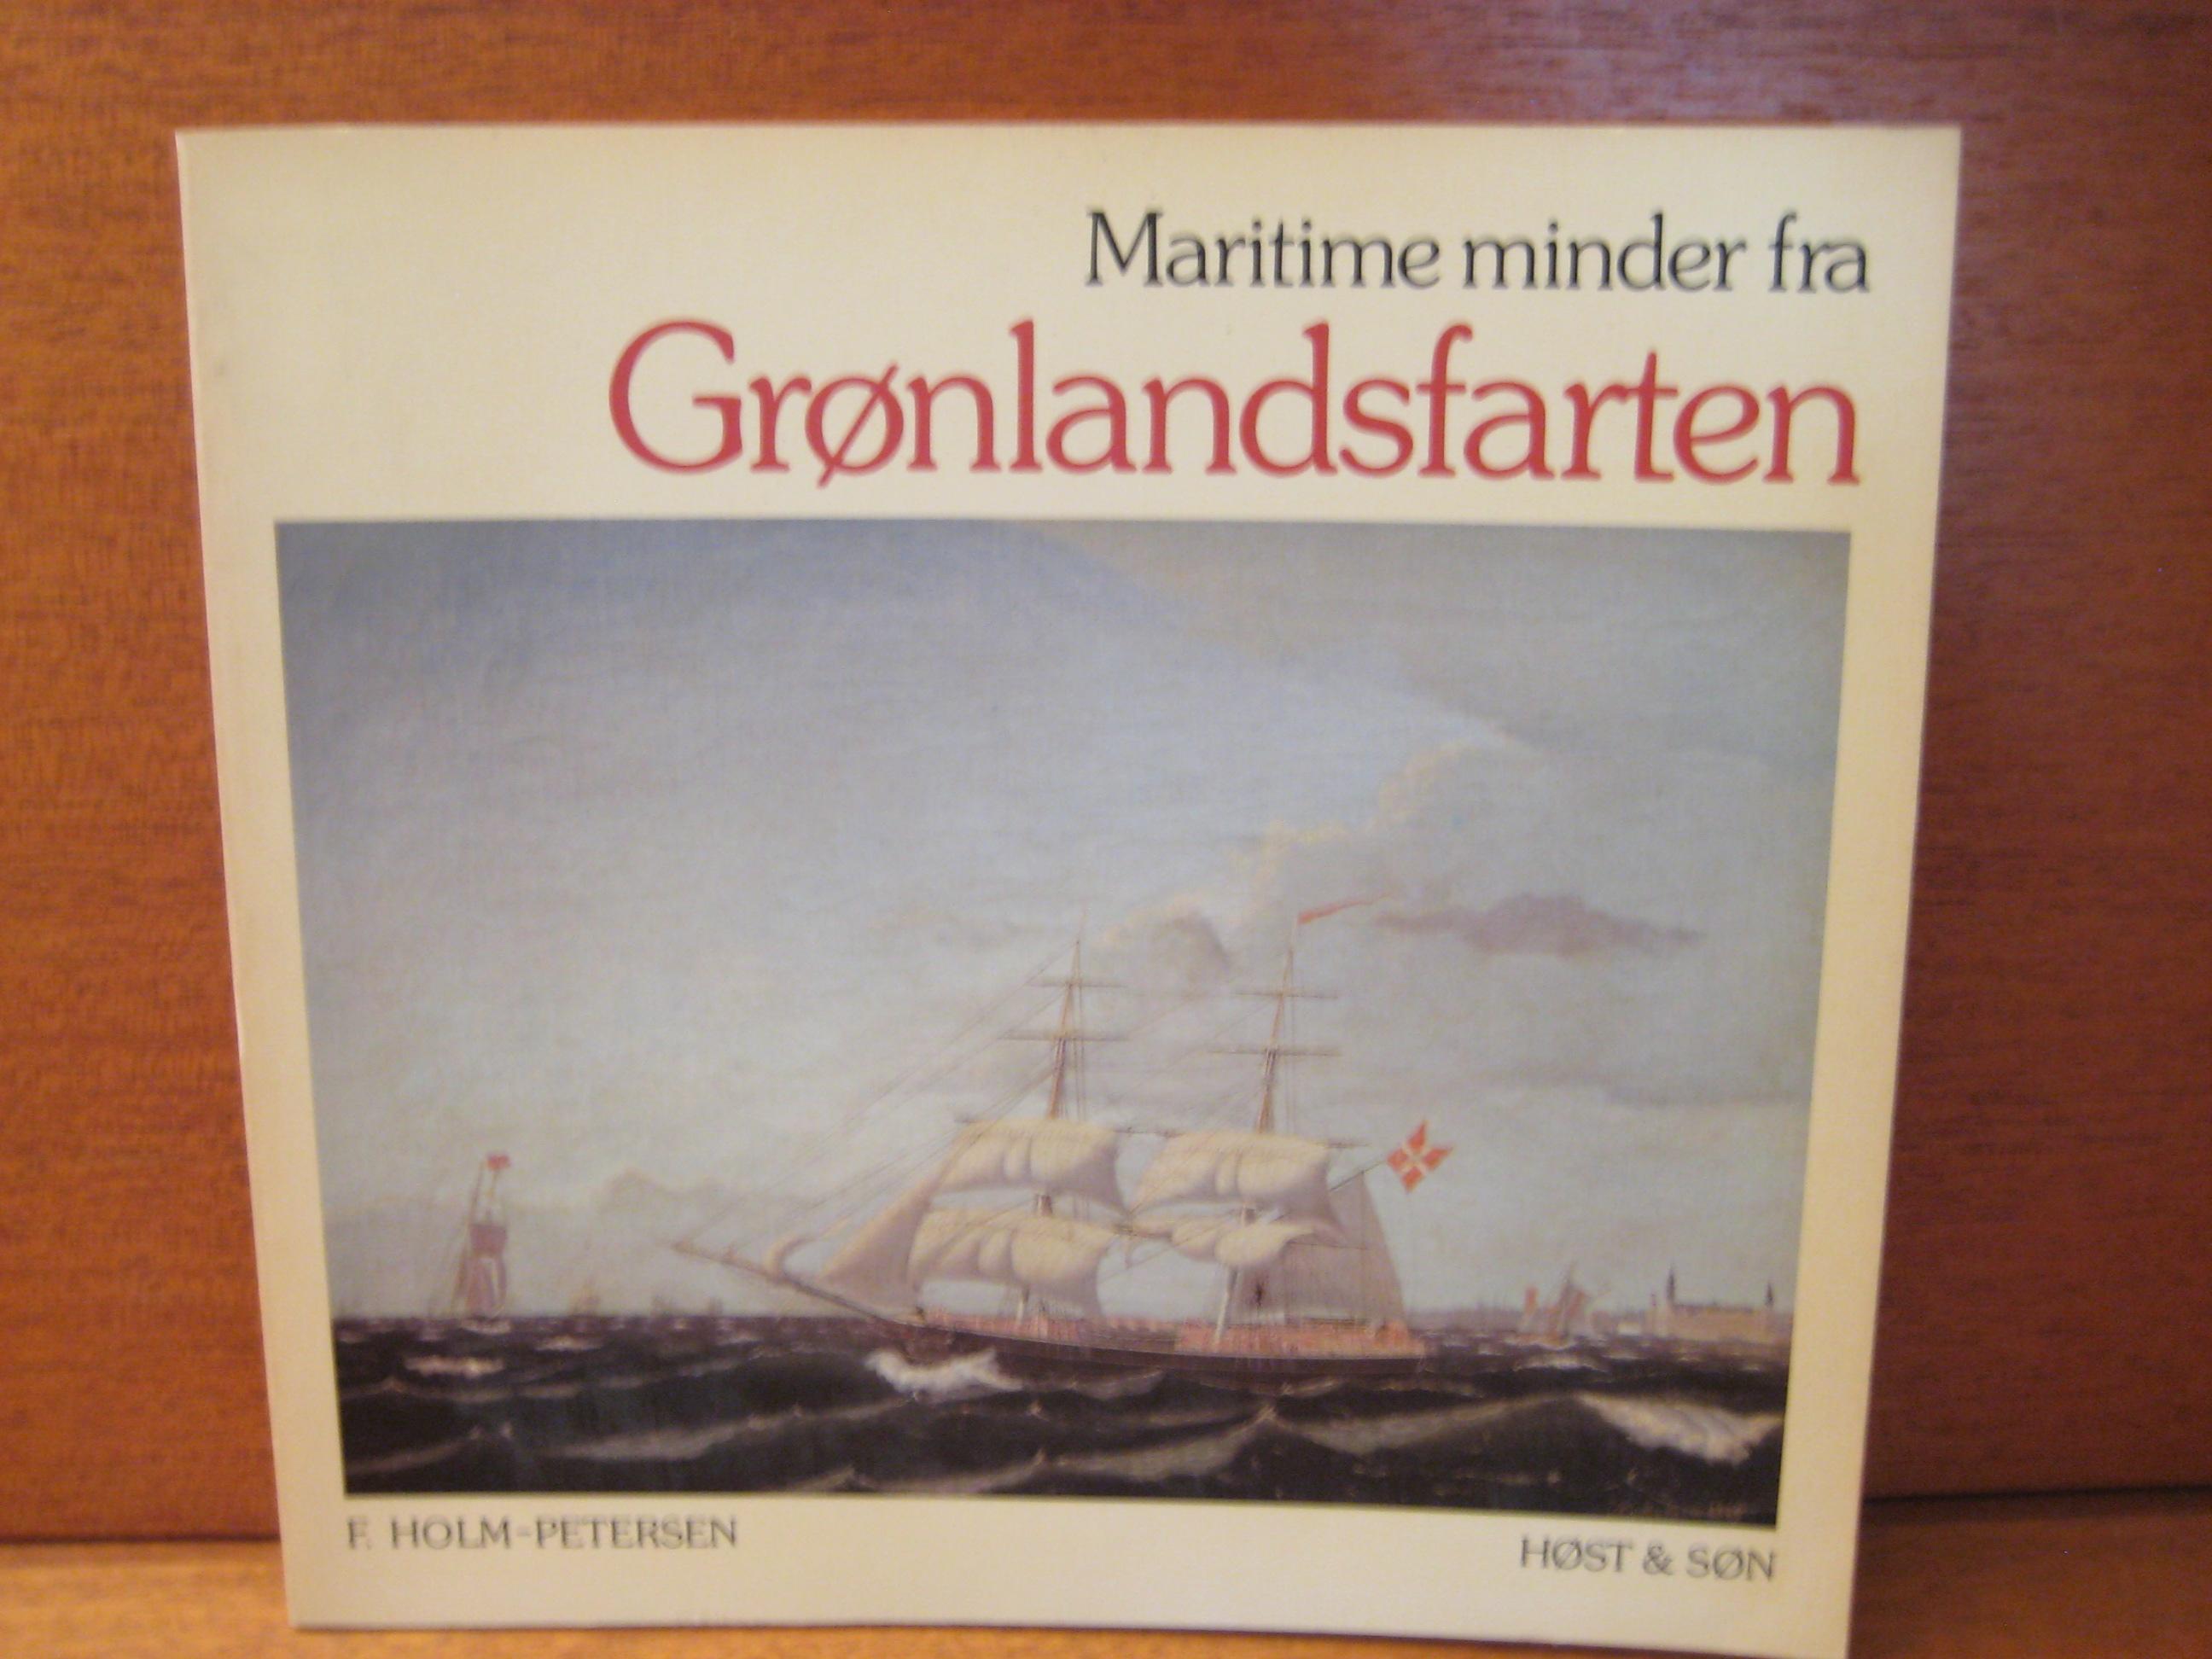 Maritime minder Grønlandsfarten